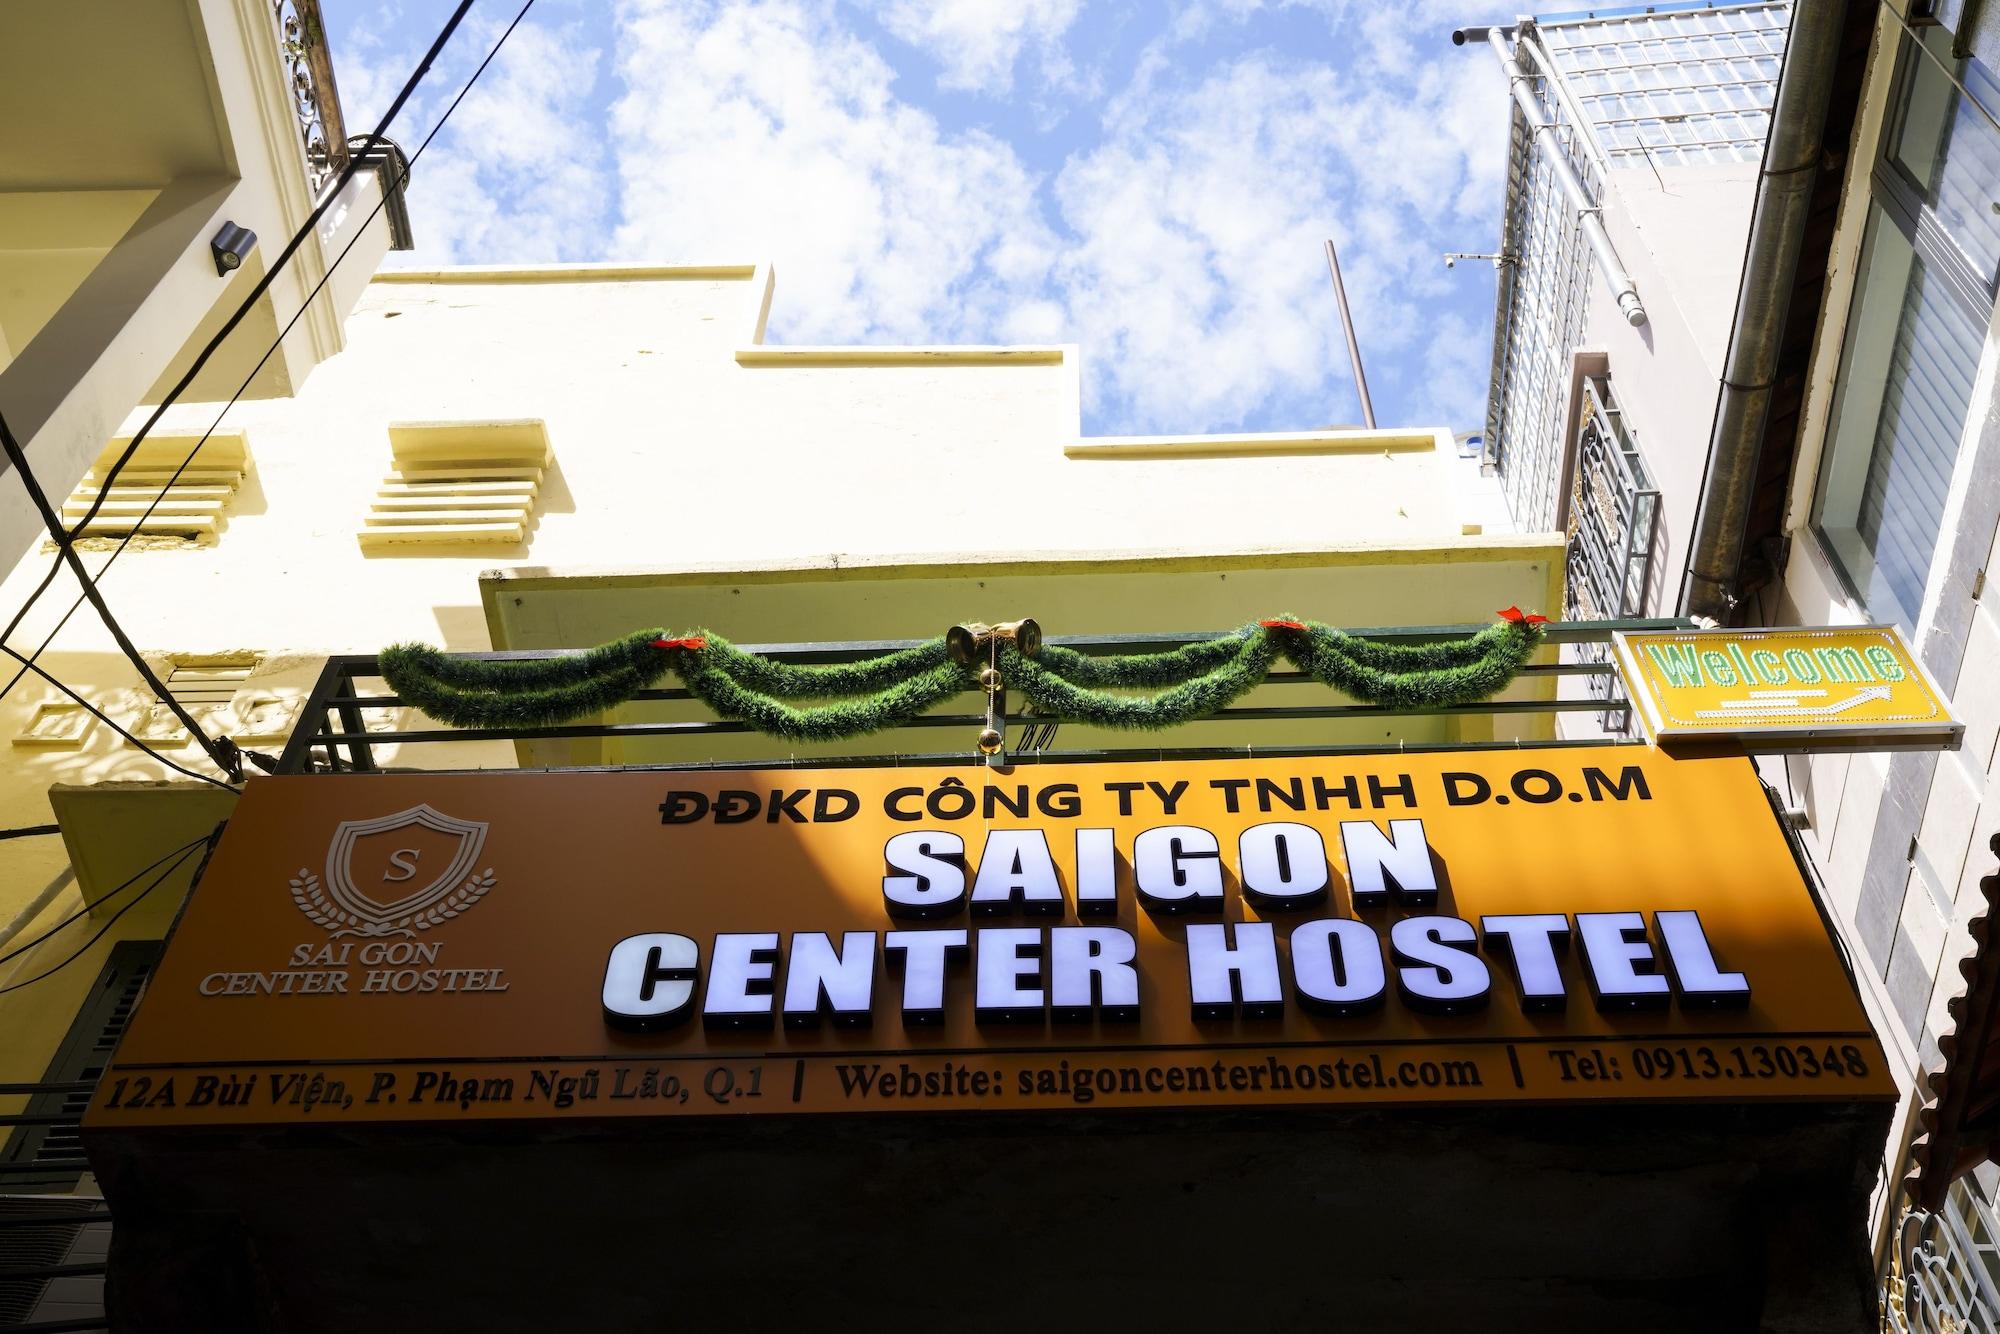 Saigon Center Hostel, Quận 1